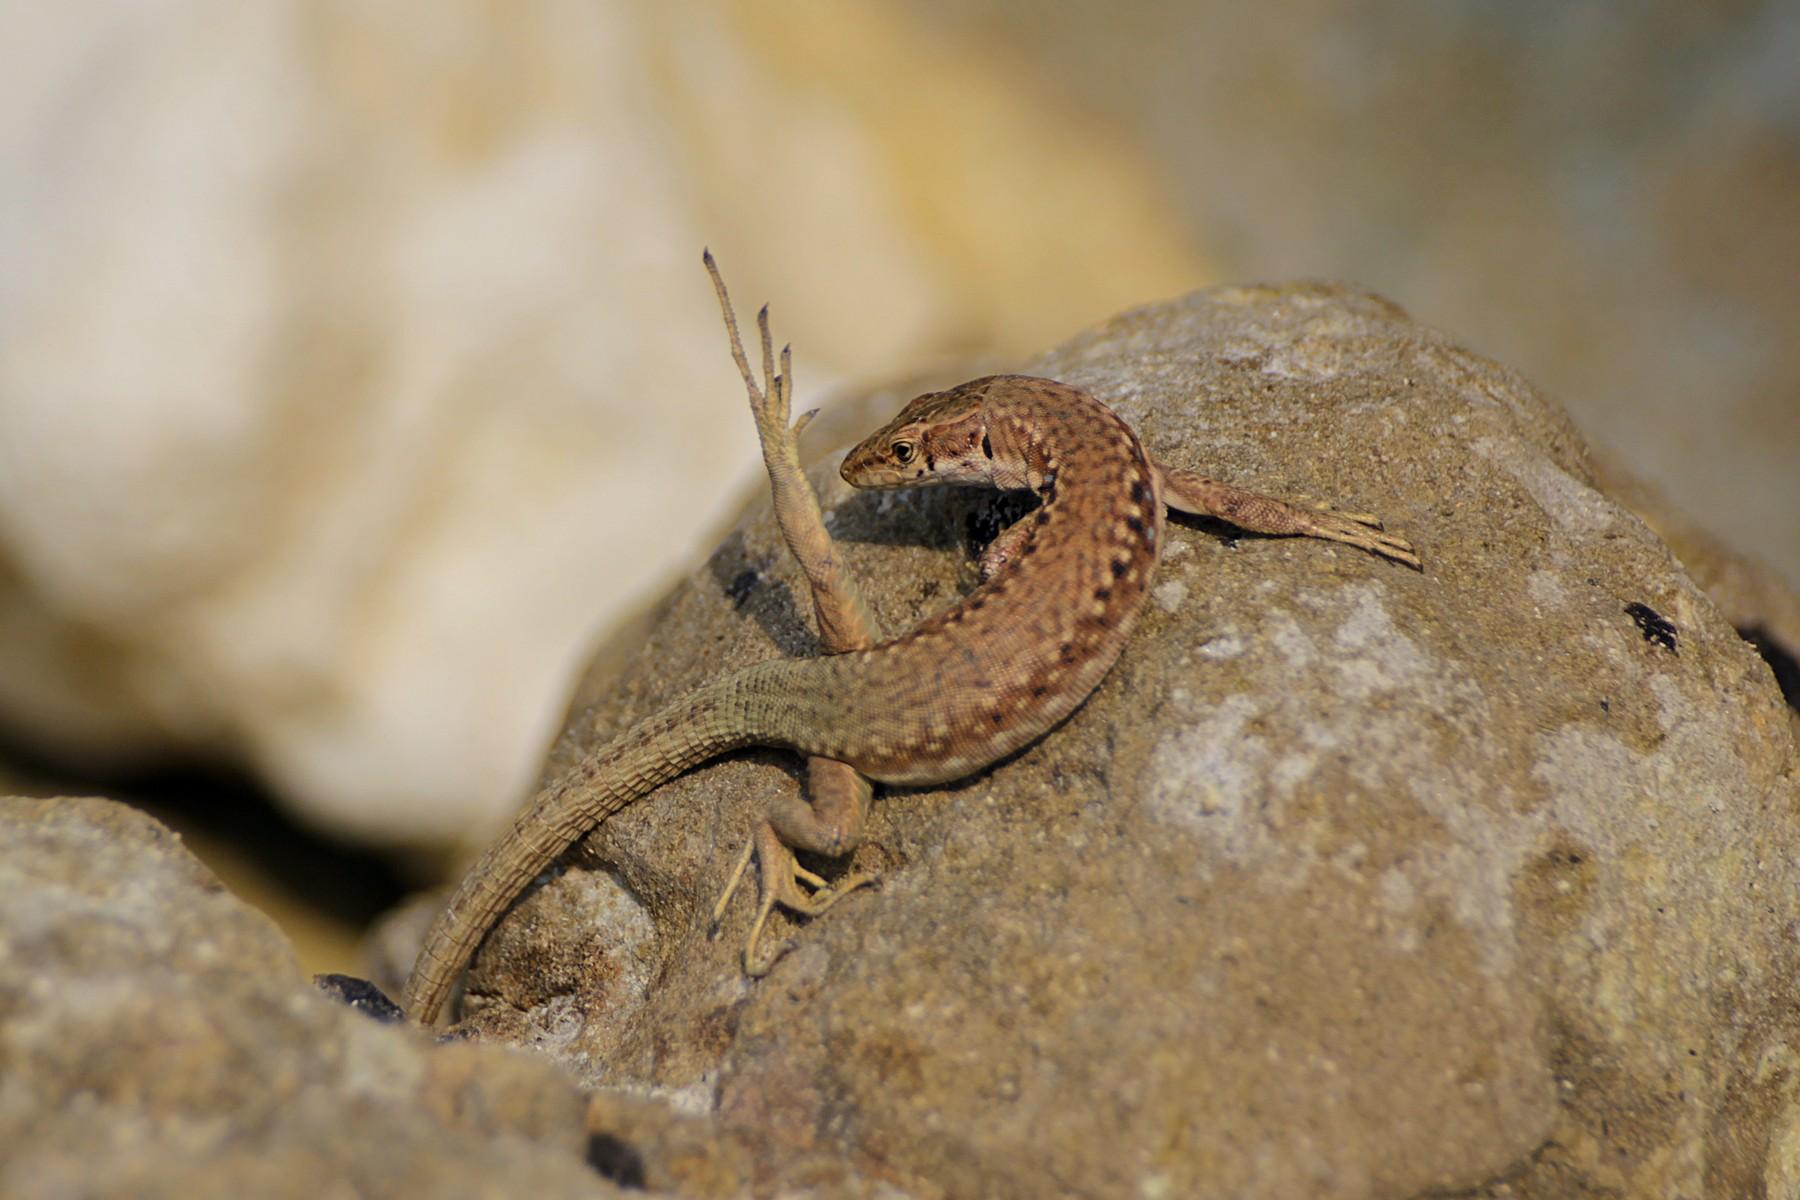 Ящерица Линдхольма (лат. Darevskia lindholmi), самка